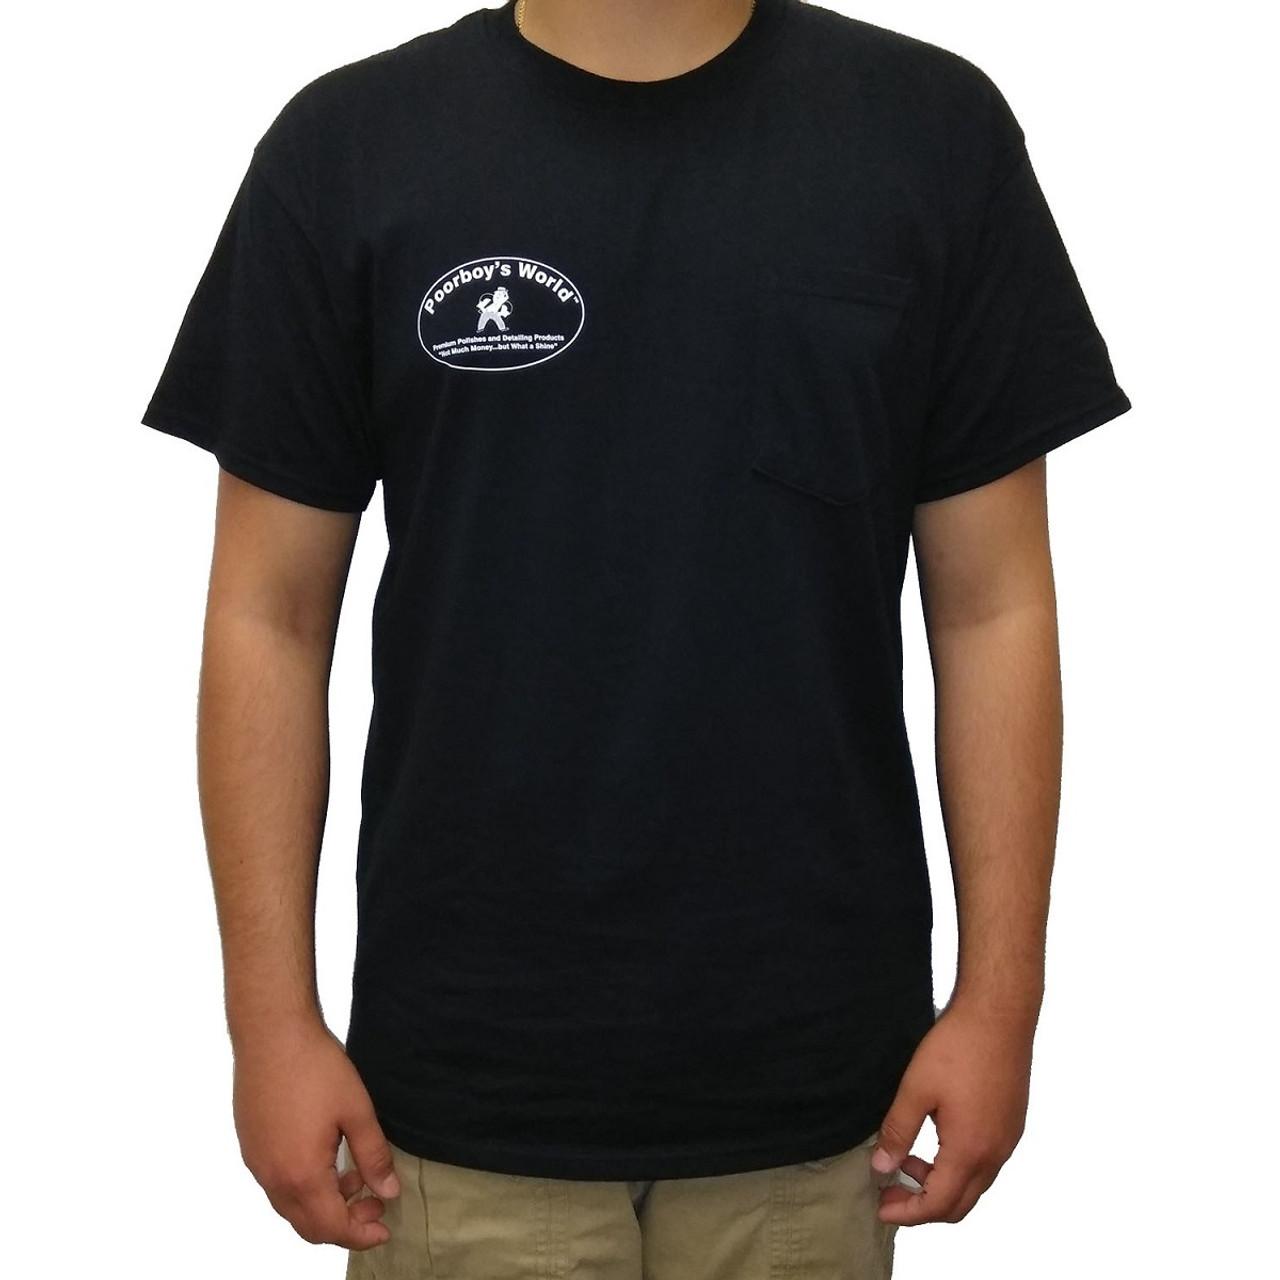 Poorboy's World Black T-Shirt w/ Pocket - 3XL - Front